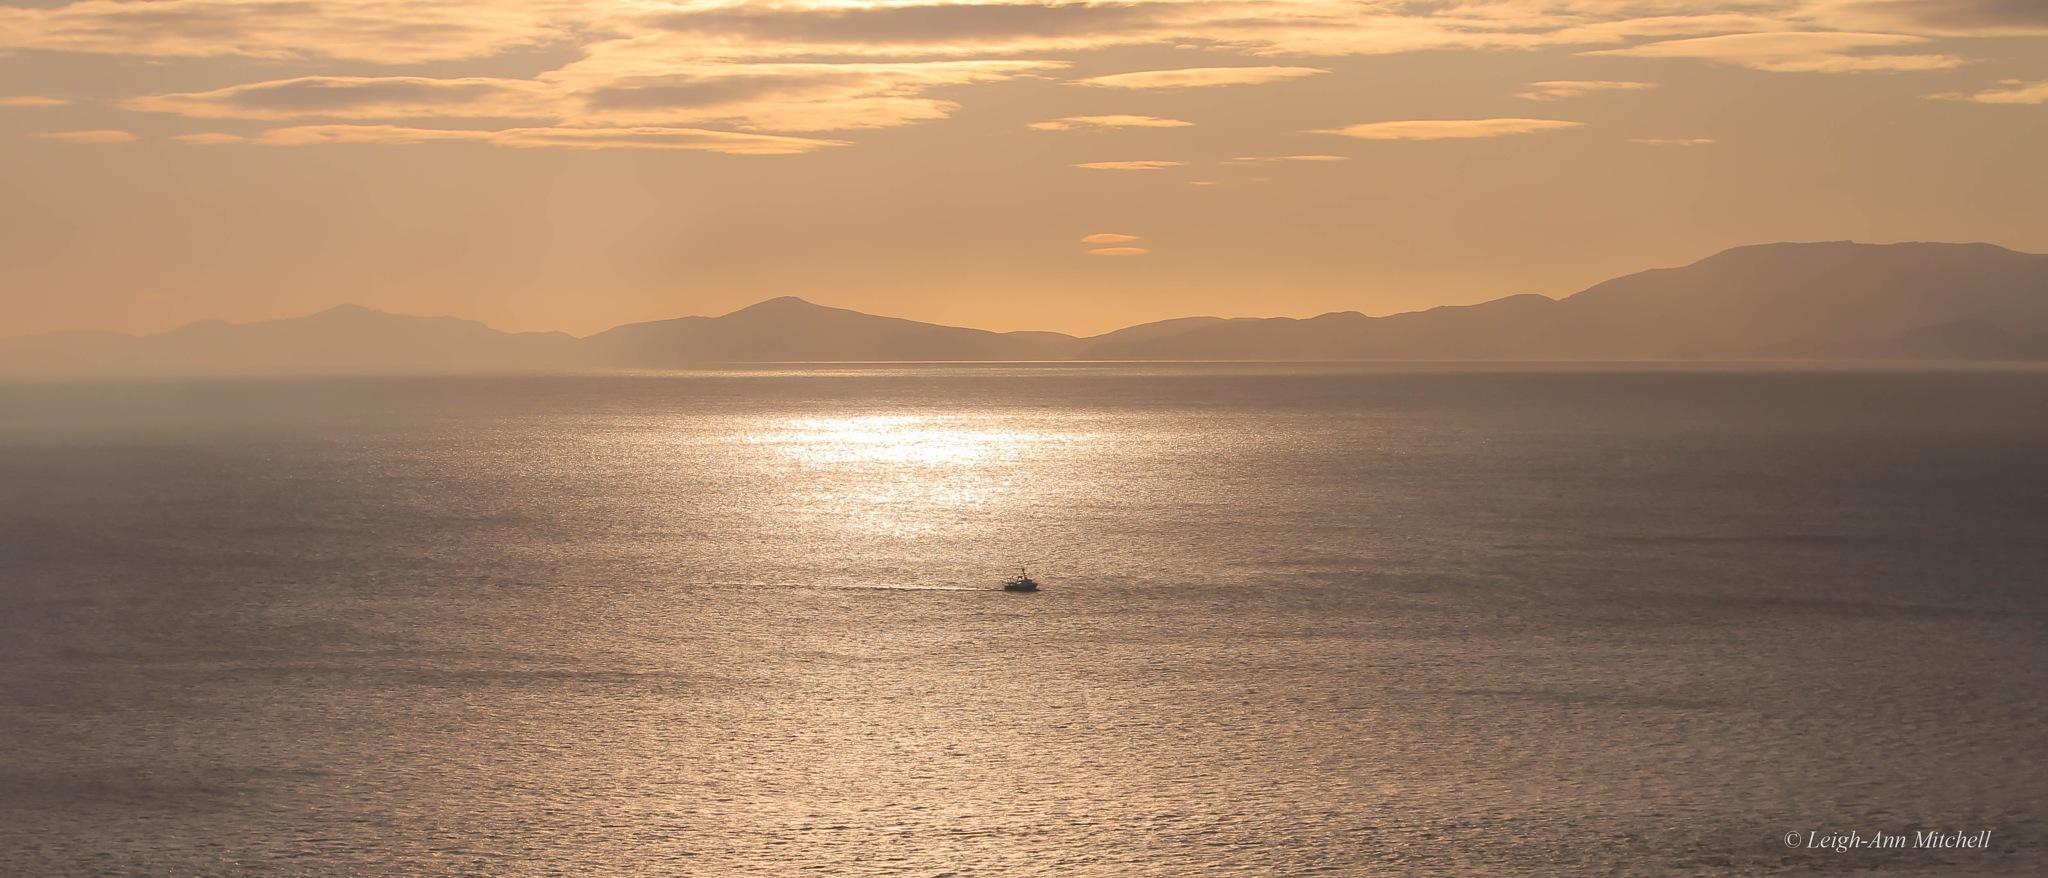 On the ocean by Leigh-Ann Mitchell